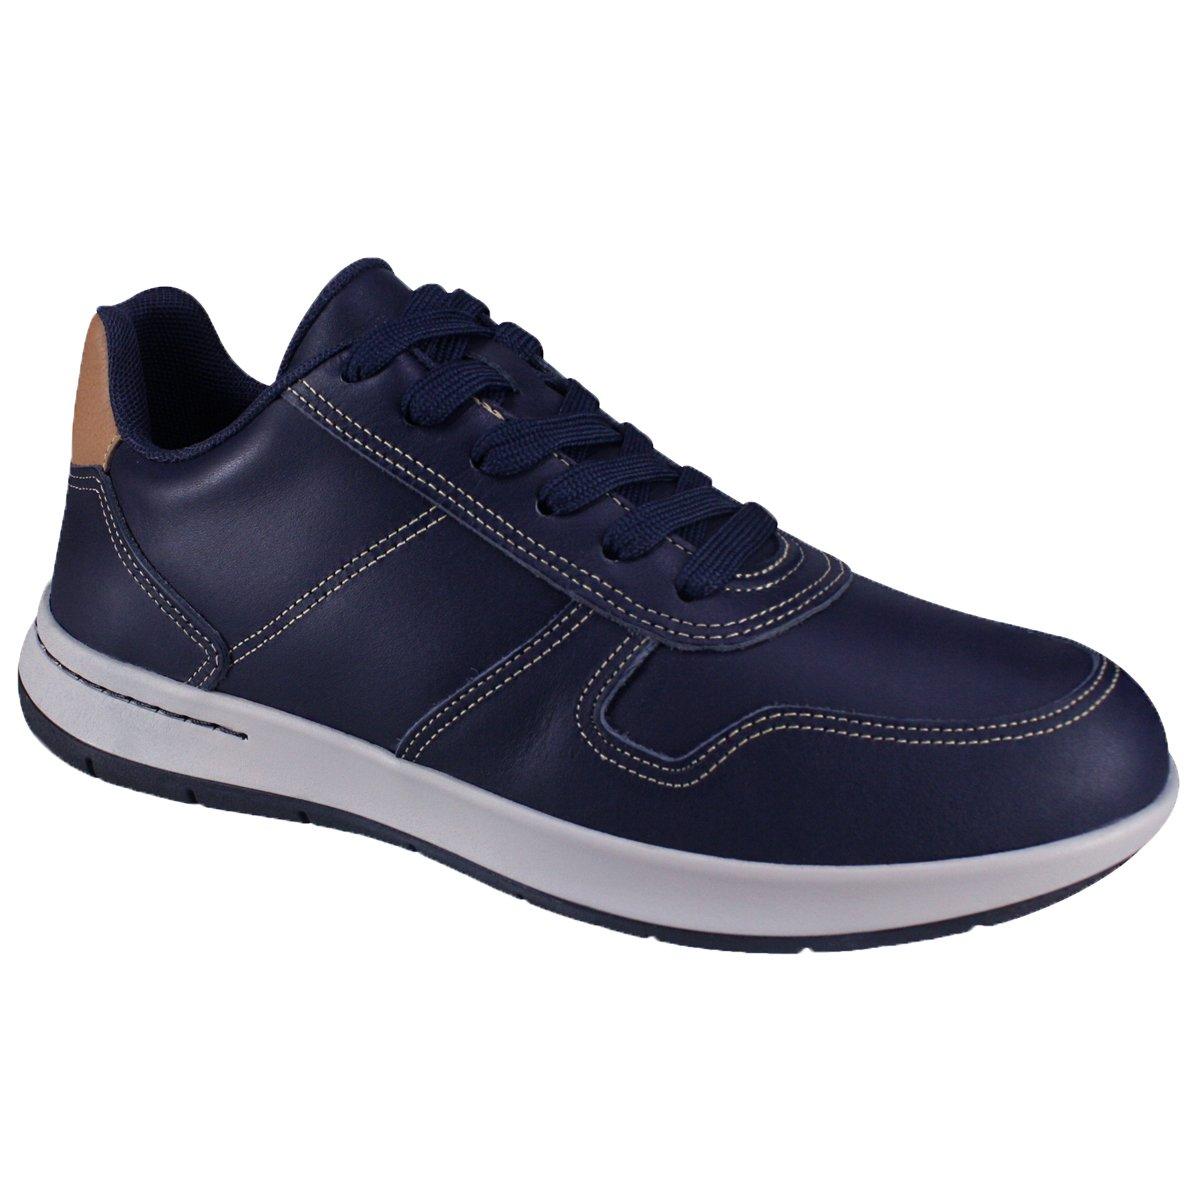 Tênis Masculino Usaflex AA2901 1 - New Blue (Fourlard Verona ... 27ef1cfcbe0f3